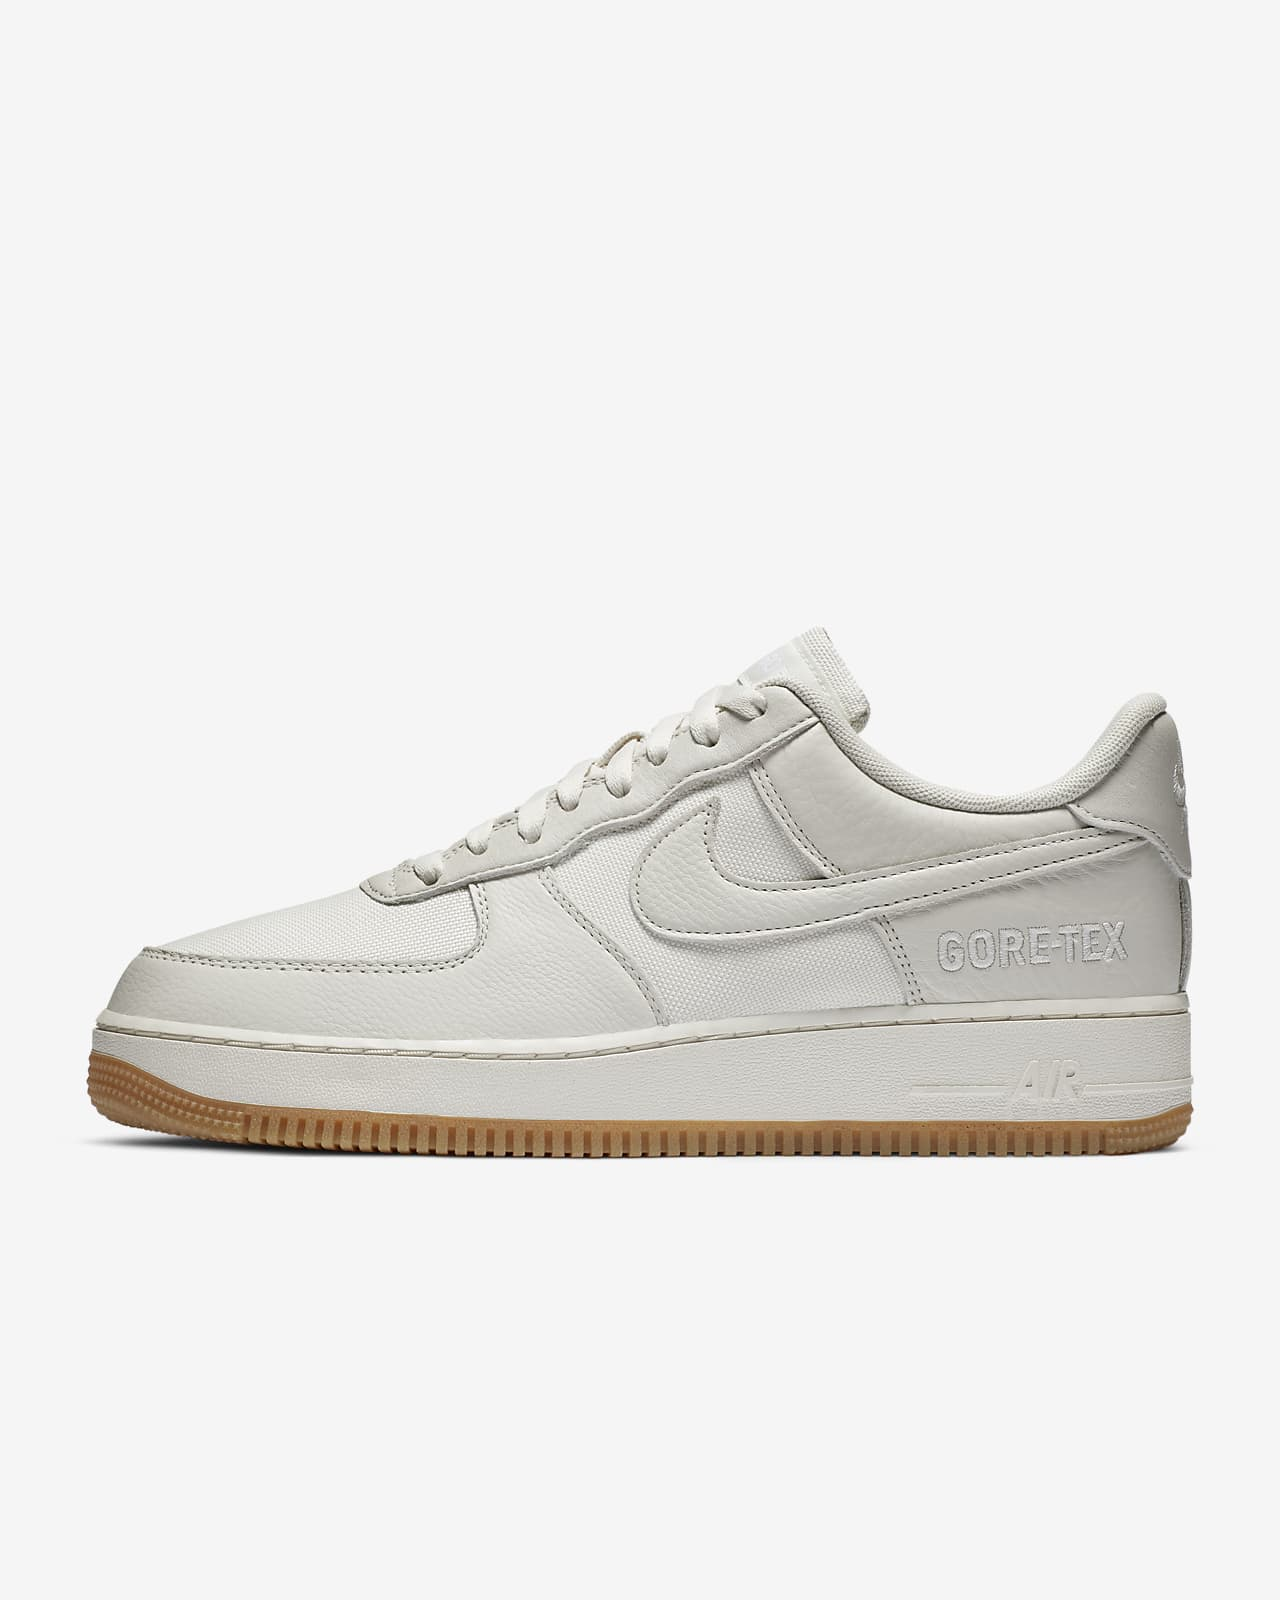 Sapatilhas Nike Air Force 1 Low GORE-TEX para homem